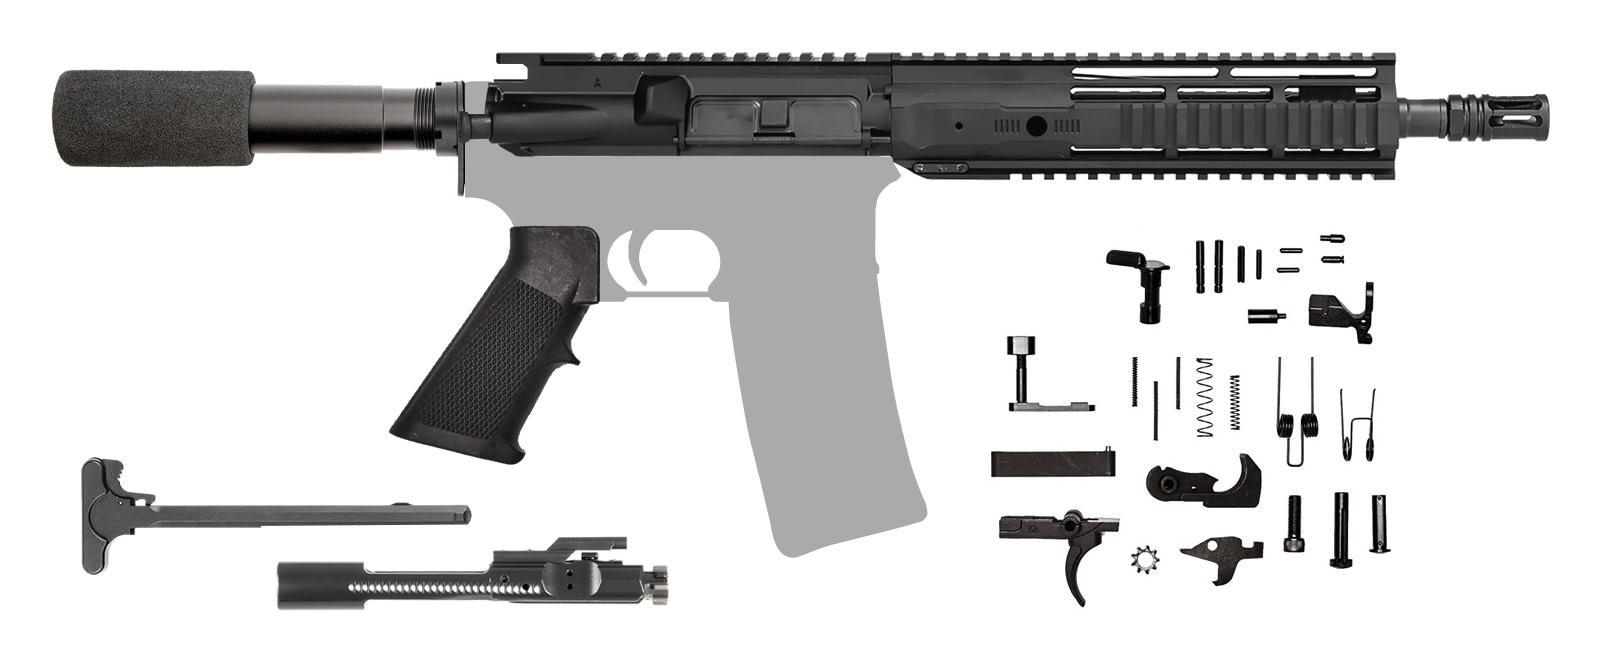 "AR-15 AR Pistol Kit 10.5"" .223 / 5.56 NATO IRS Rail"